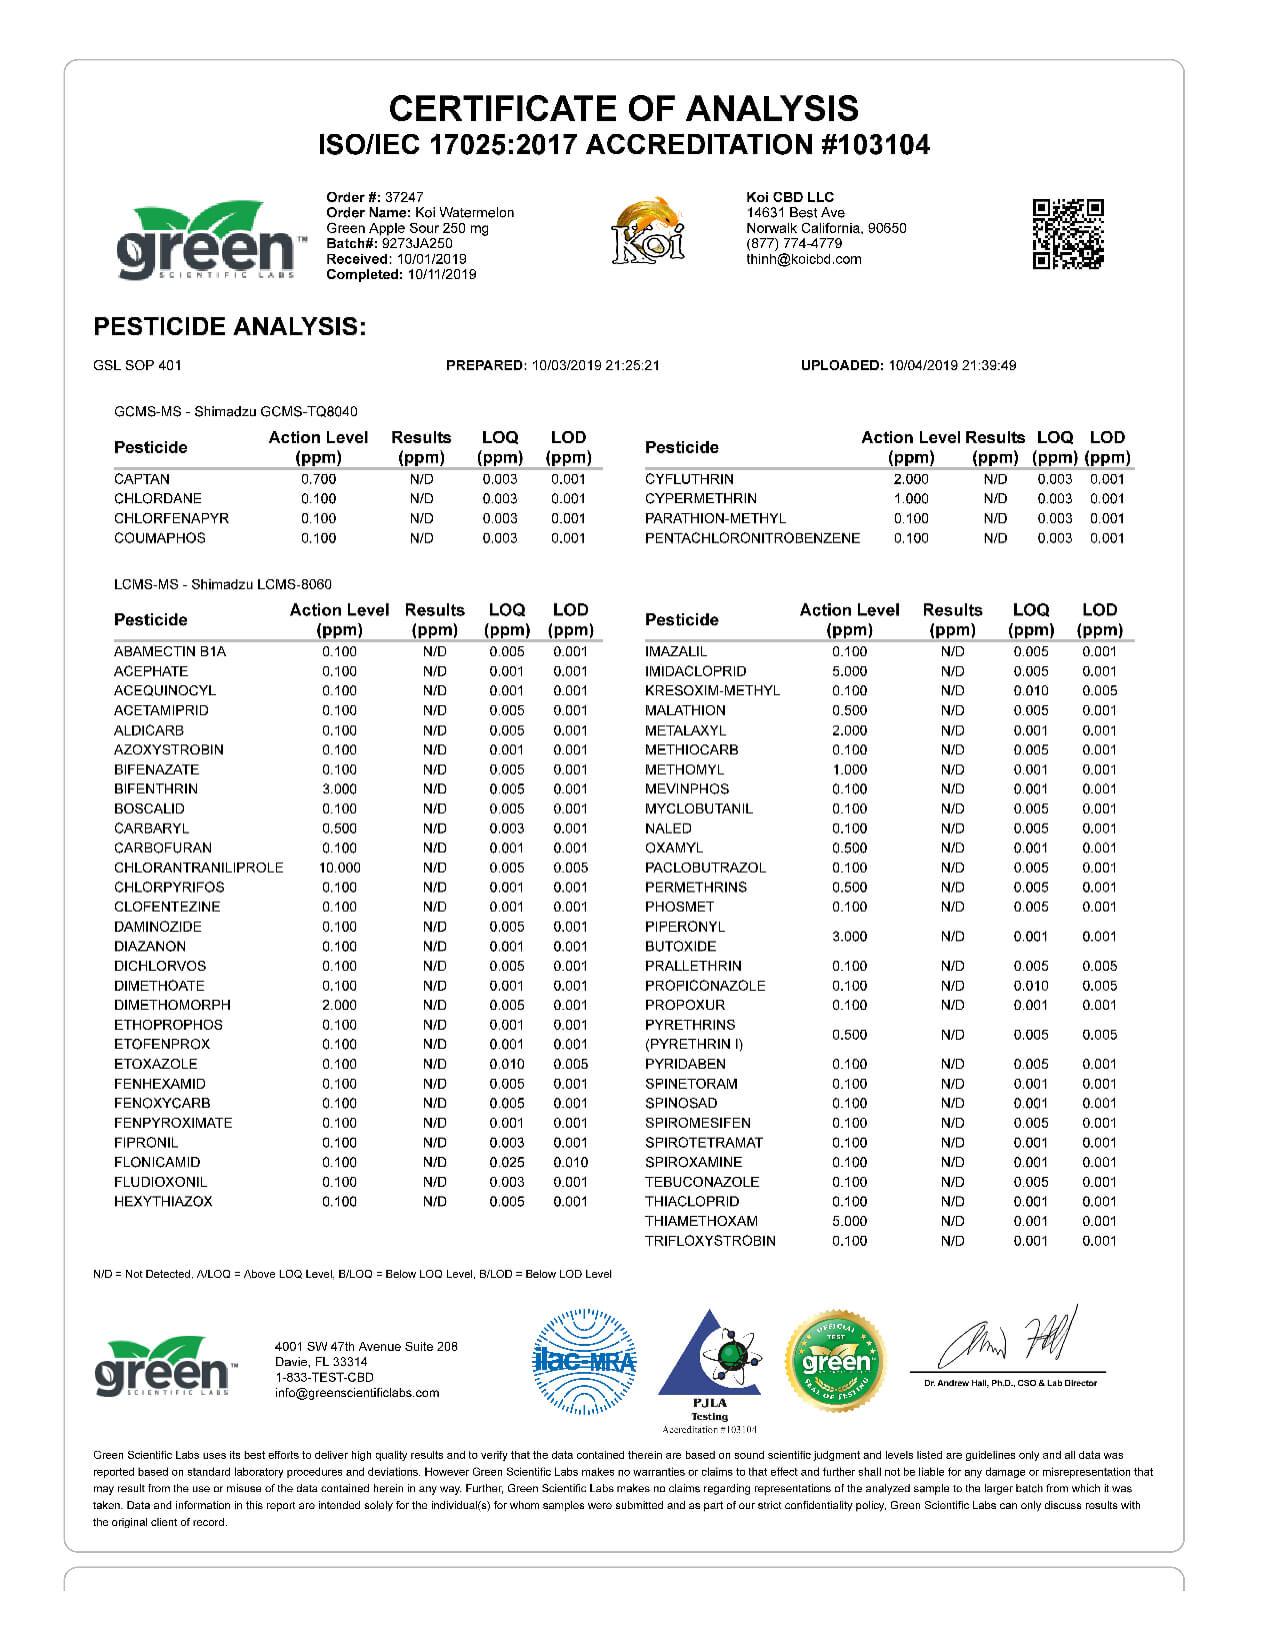 Koi CBD Watermelon Green Apple Sour Vape Oil 250mg page3